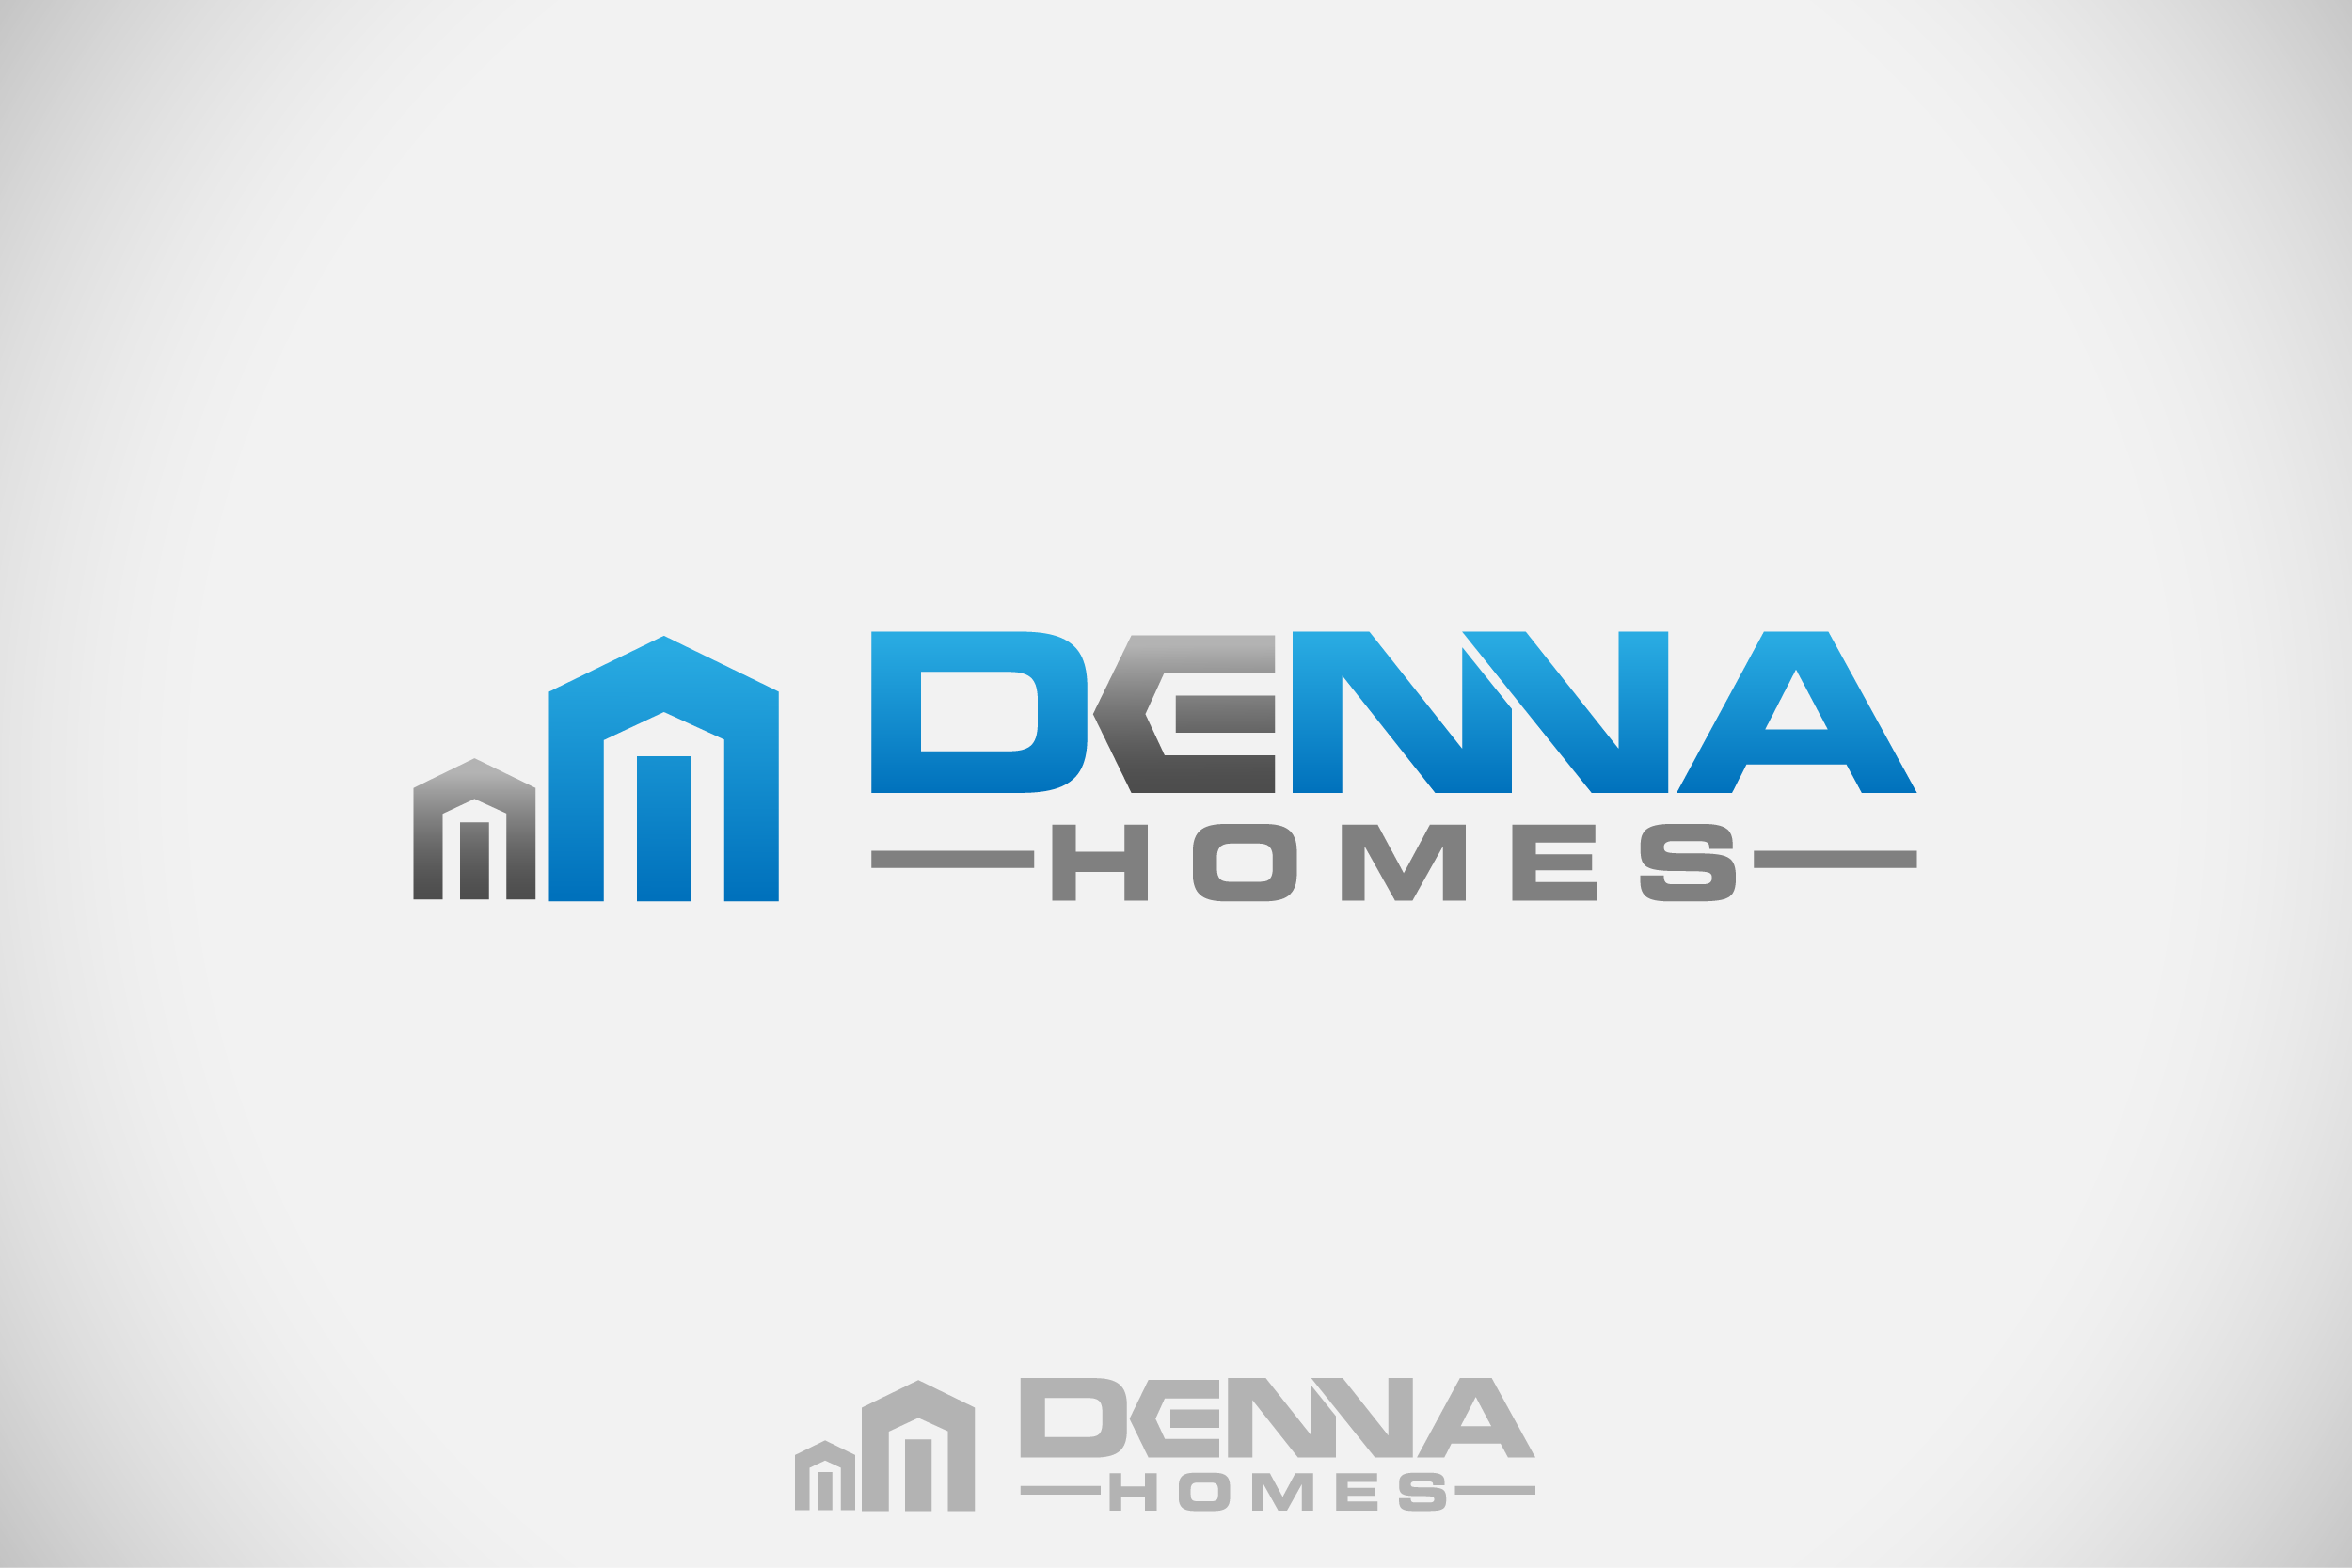 Logo Design by Private User - Entry No. 343 in the Logo Design Contest Denna Group Logo Design.